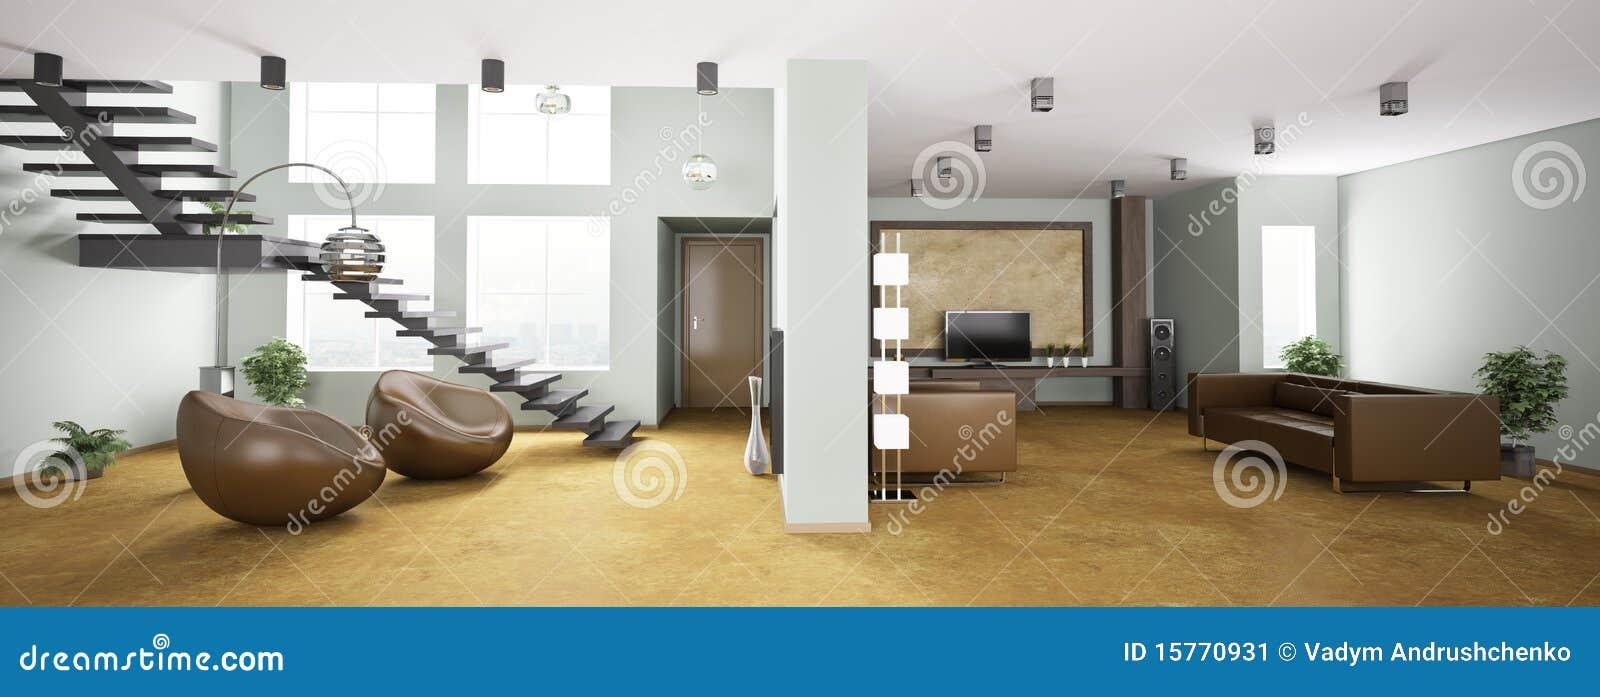 Binnenland van 3d flatpanorama